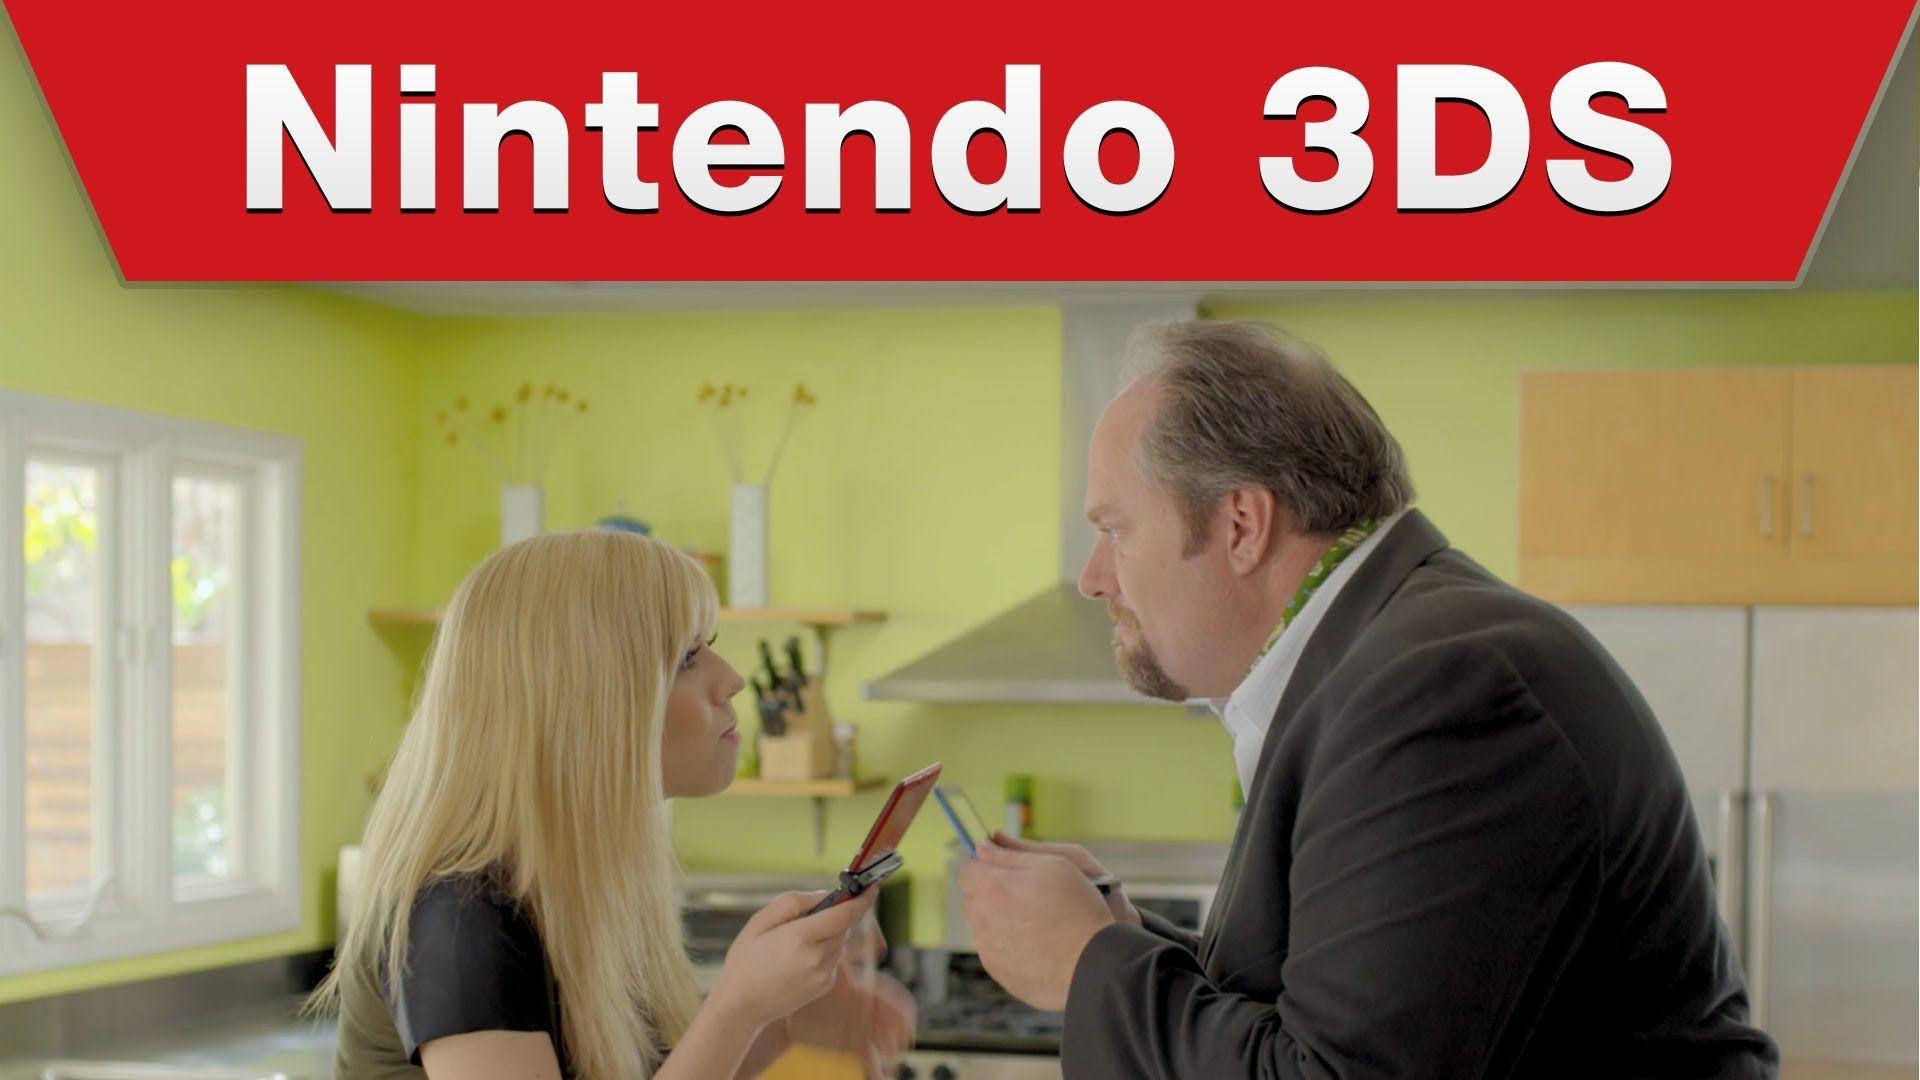 Nintendo 3DS - Mario Party: Island Tour - Jennette McCurdy Plays Choicest Voice